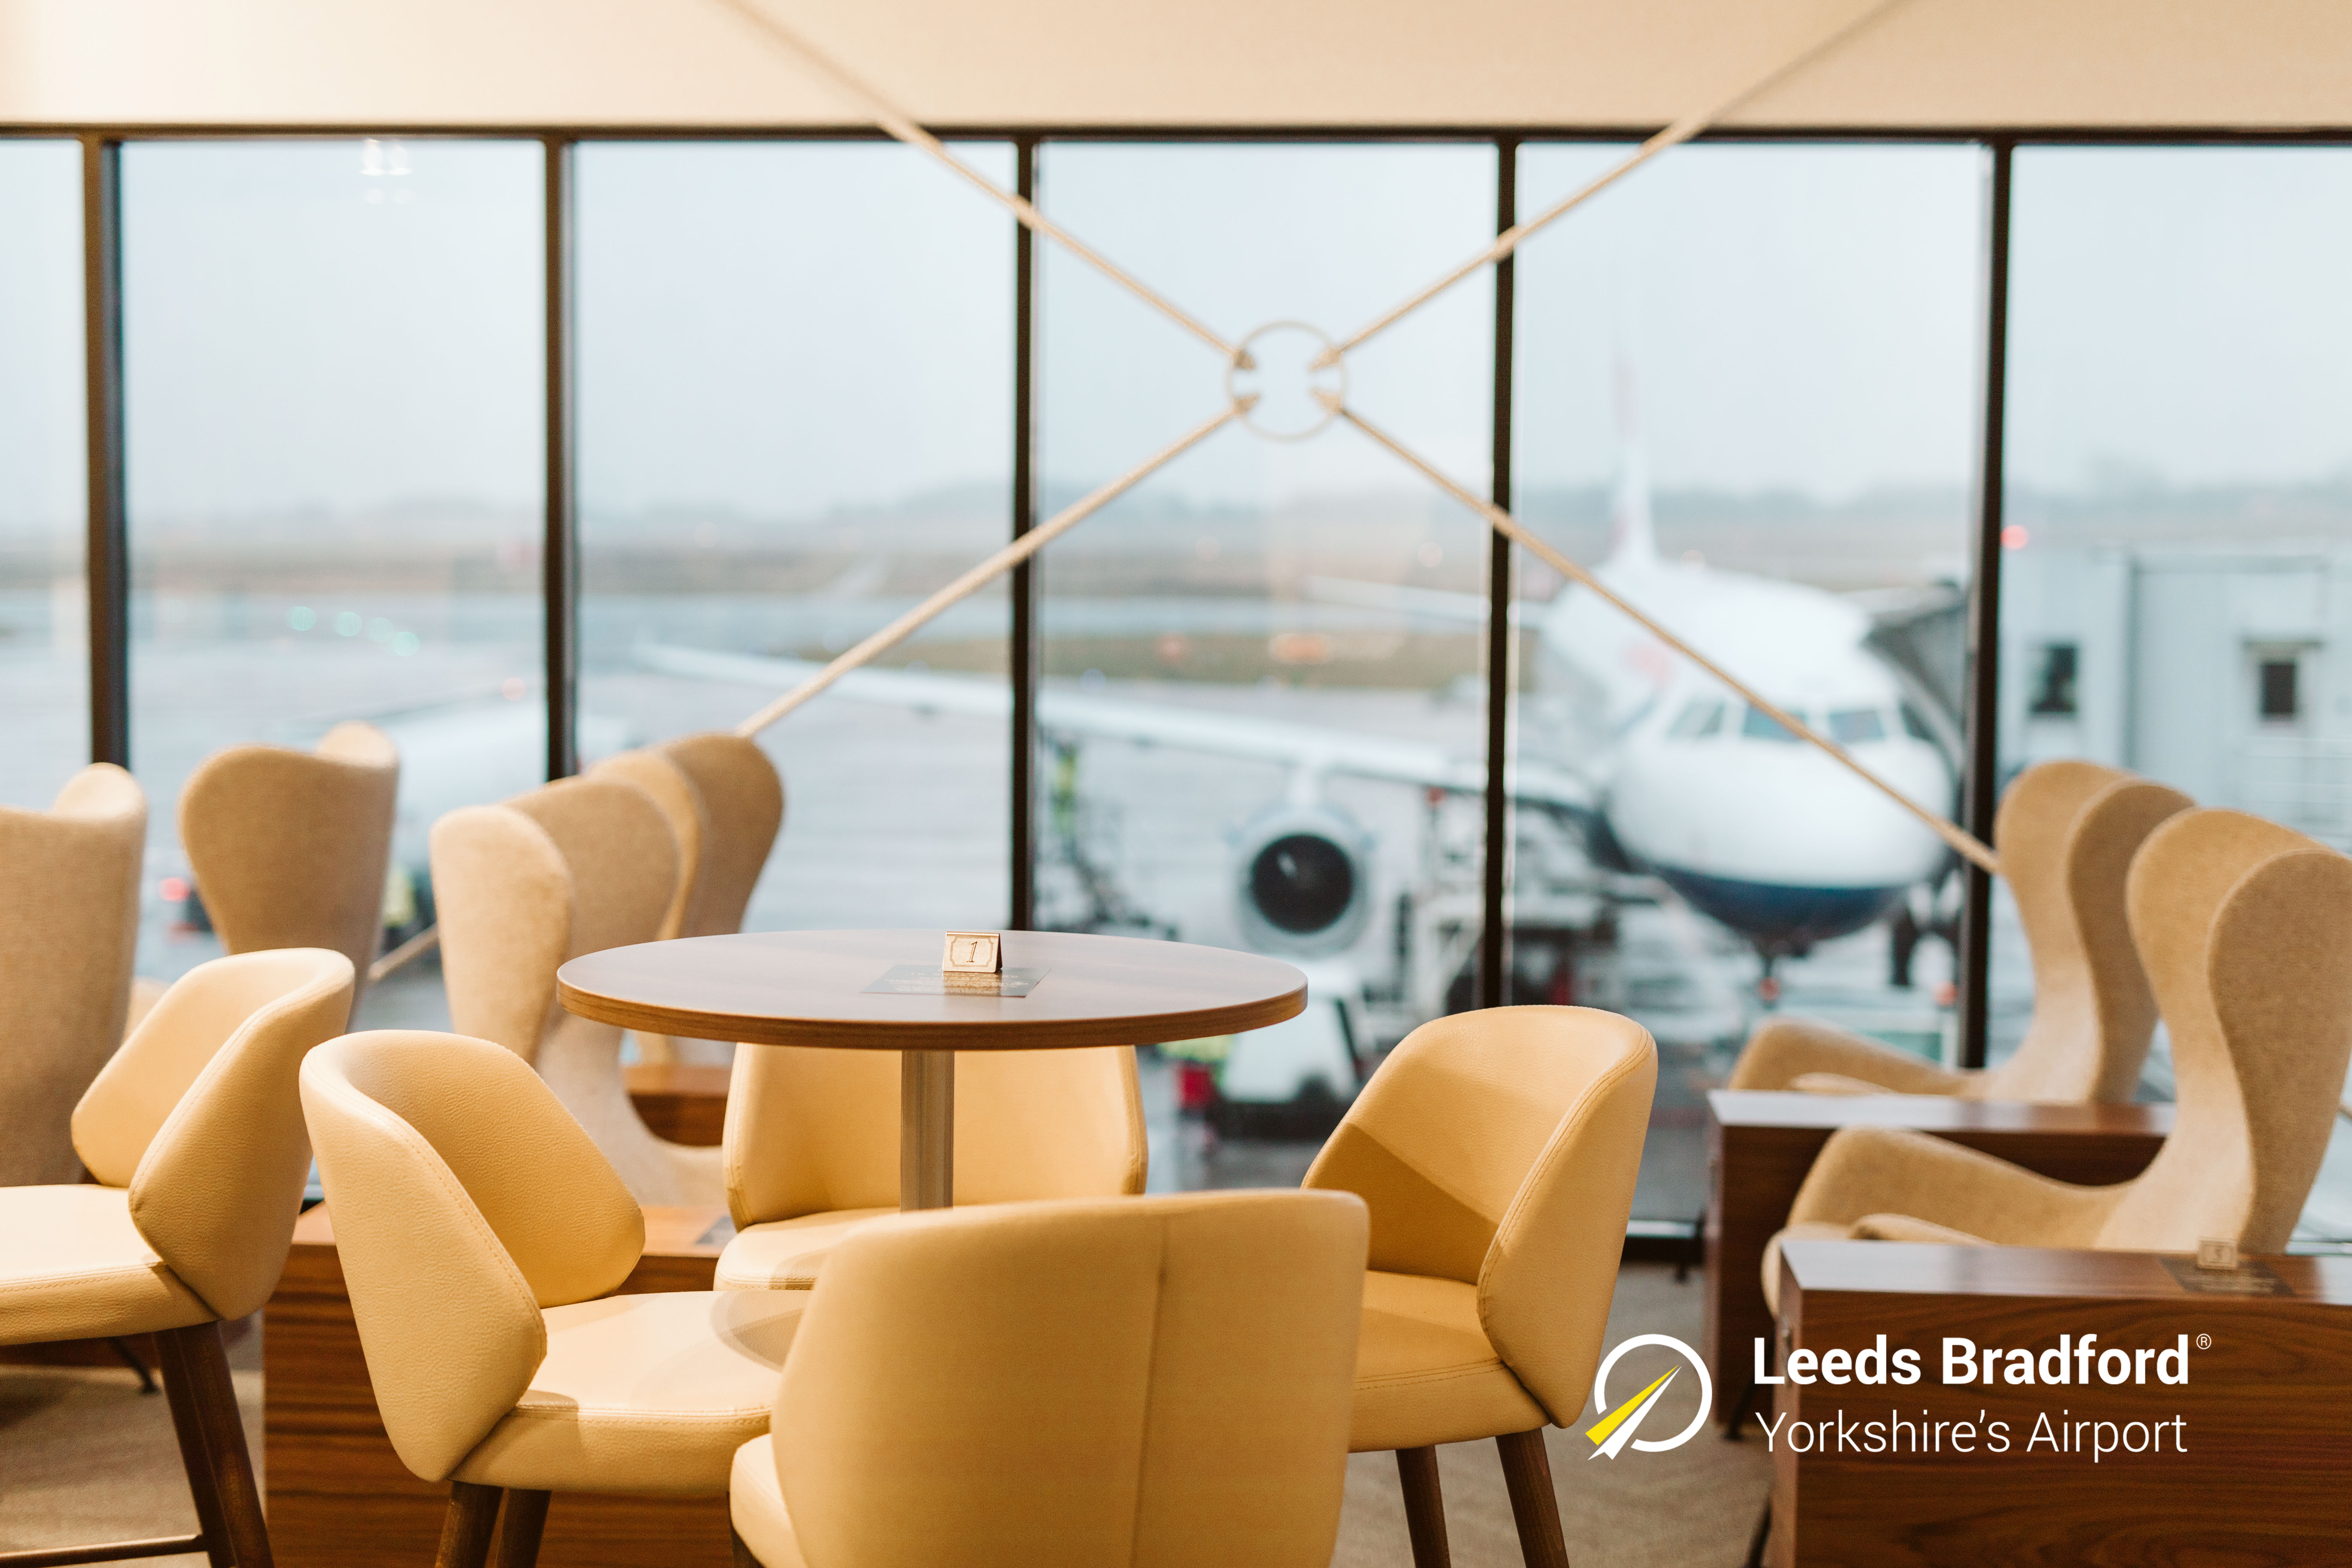 Leeds Bradford, Yorkshire's Airport